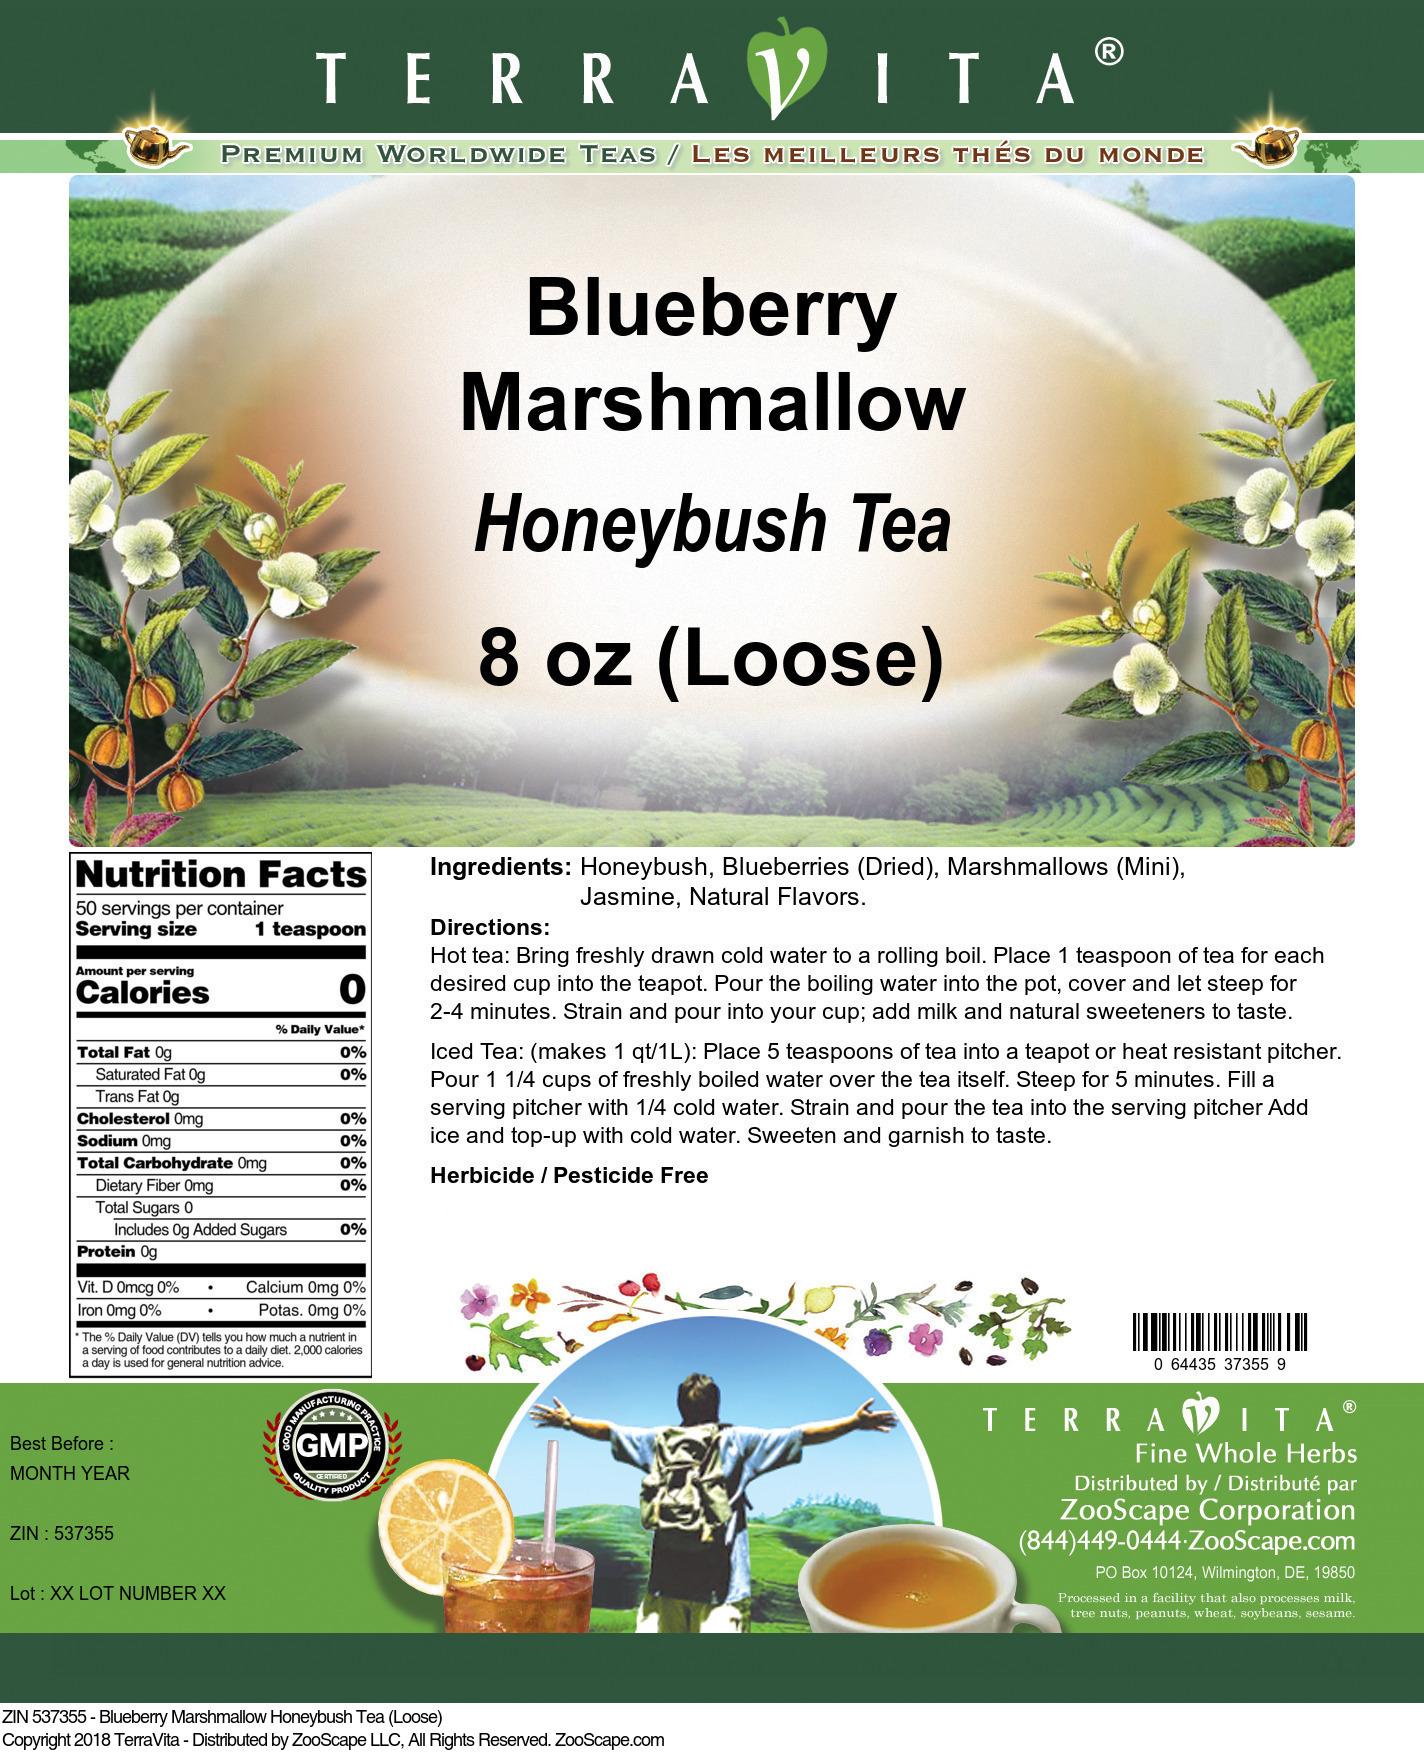 Blueberry Marshmallow Honeybush Tea